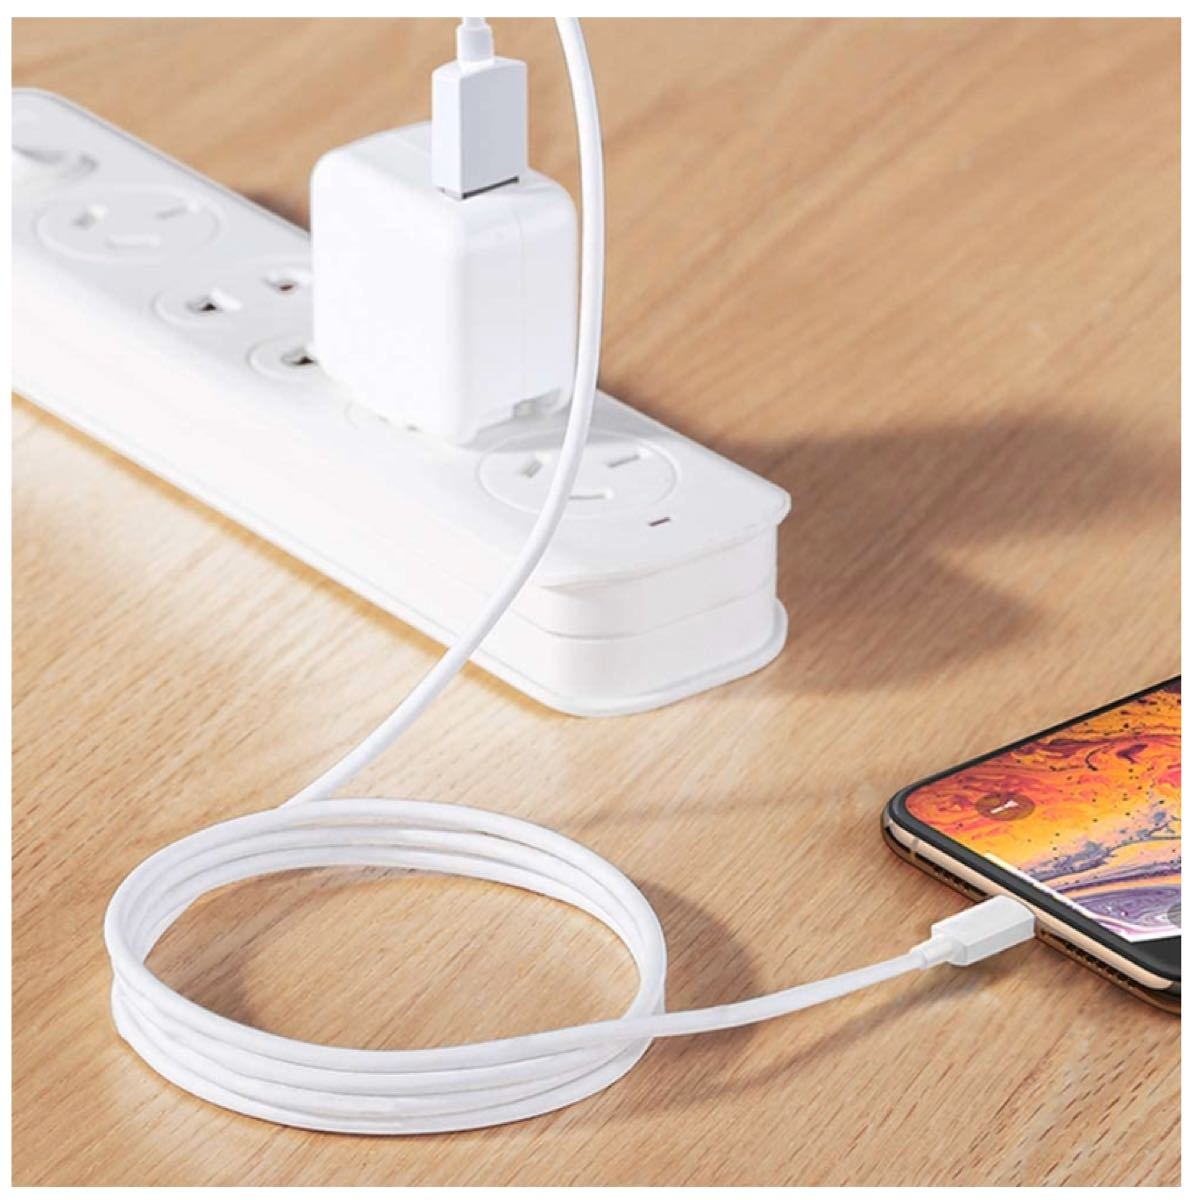 iPhone充電ケーブル(急速充電 ライトニングケーブル)